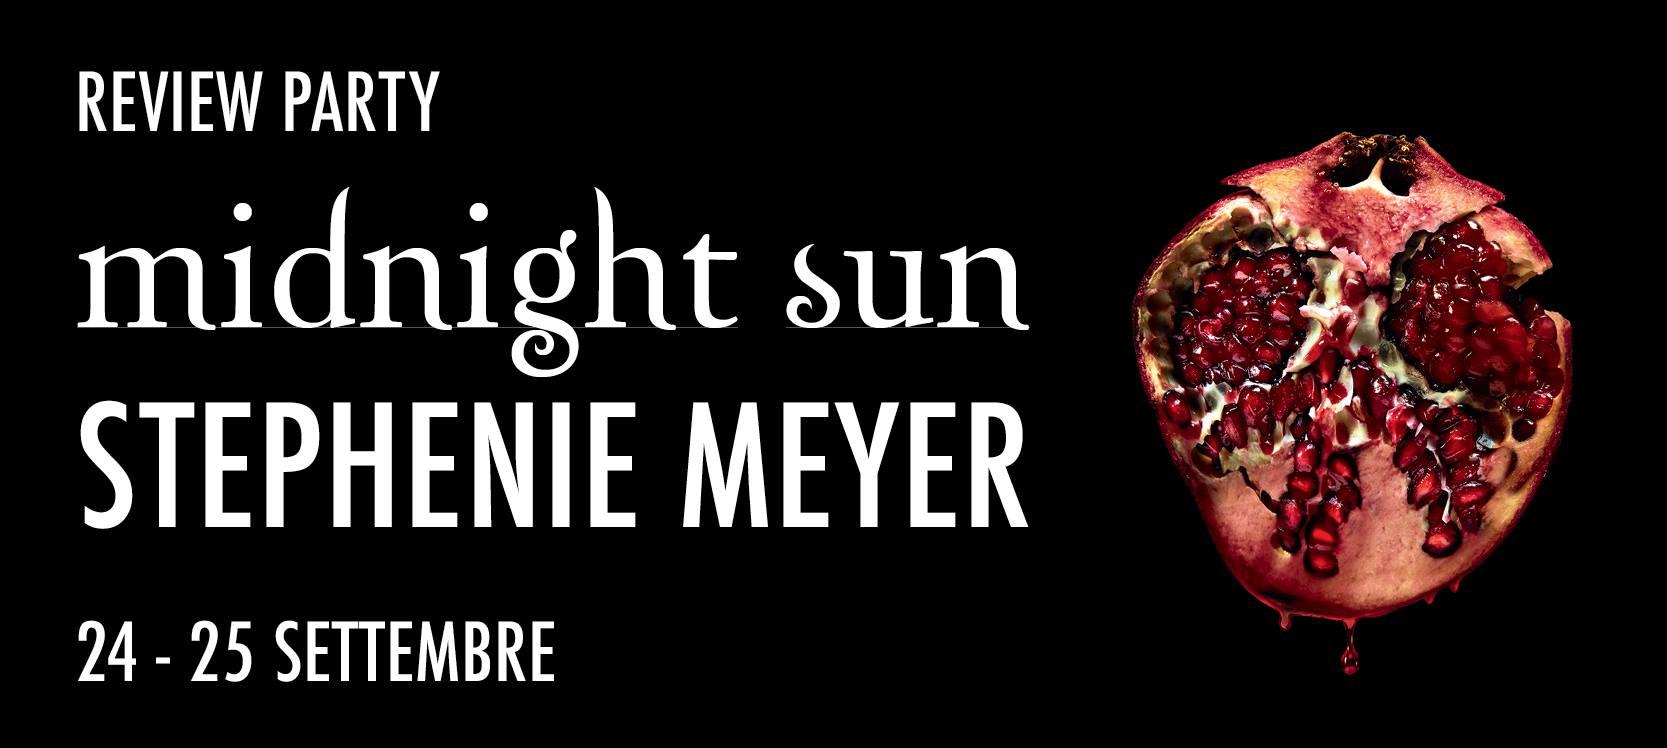 Review Party - Midnight Sun di Stephenie Meyer